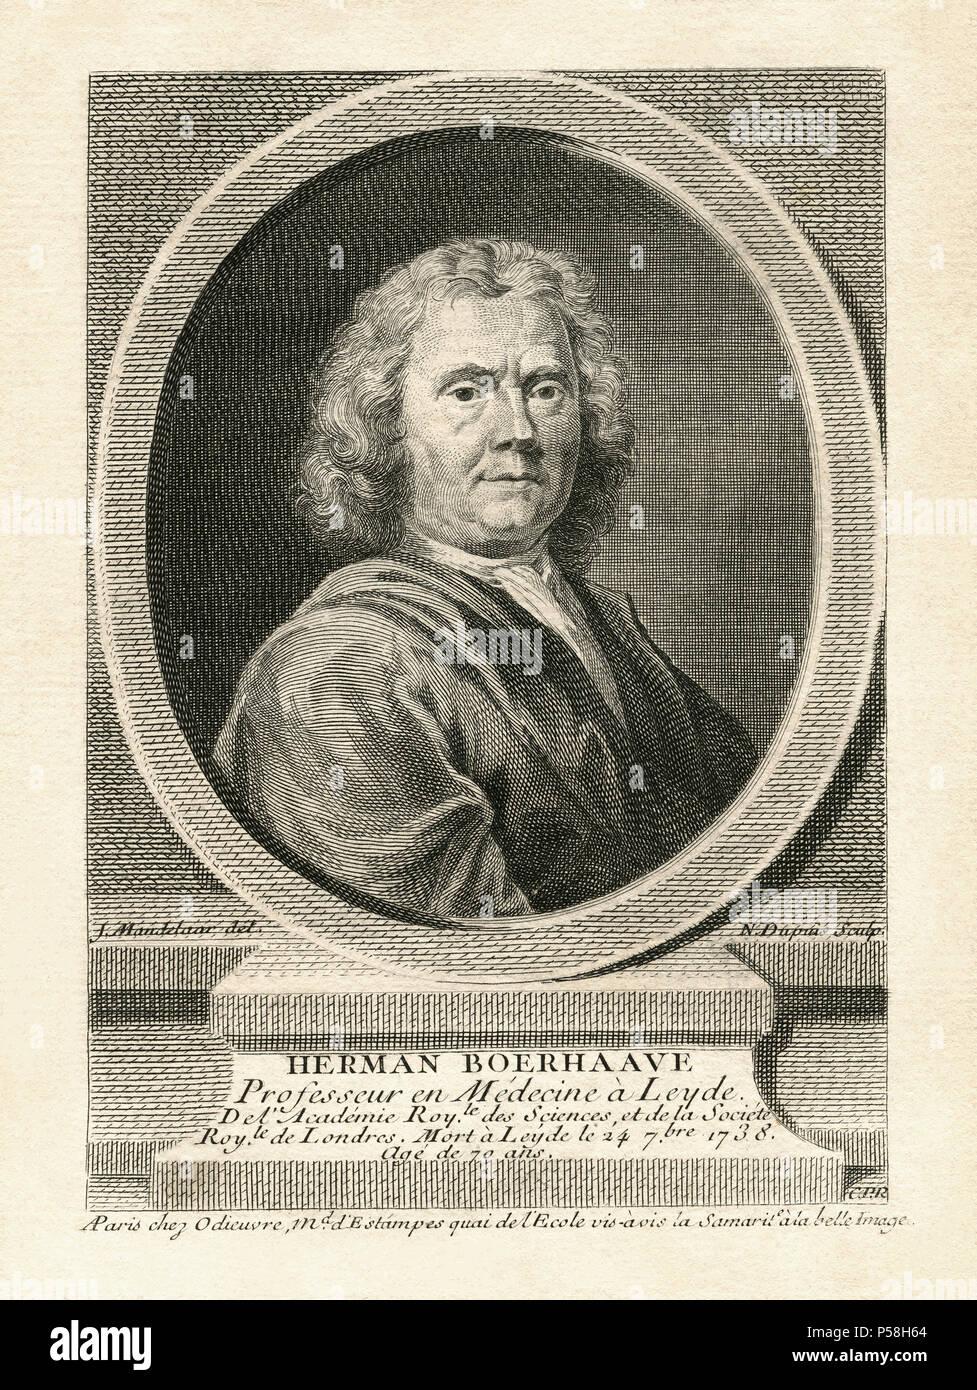 Herman Boerhaave (1668-1738), botánico holandés, farmacia, médico, humanista y cristiana de cabeza y hombros grabado Imagen De Stock